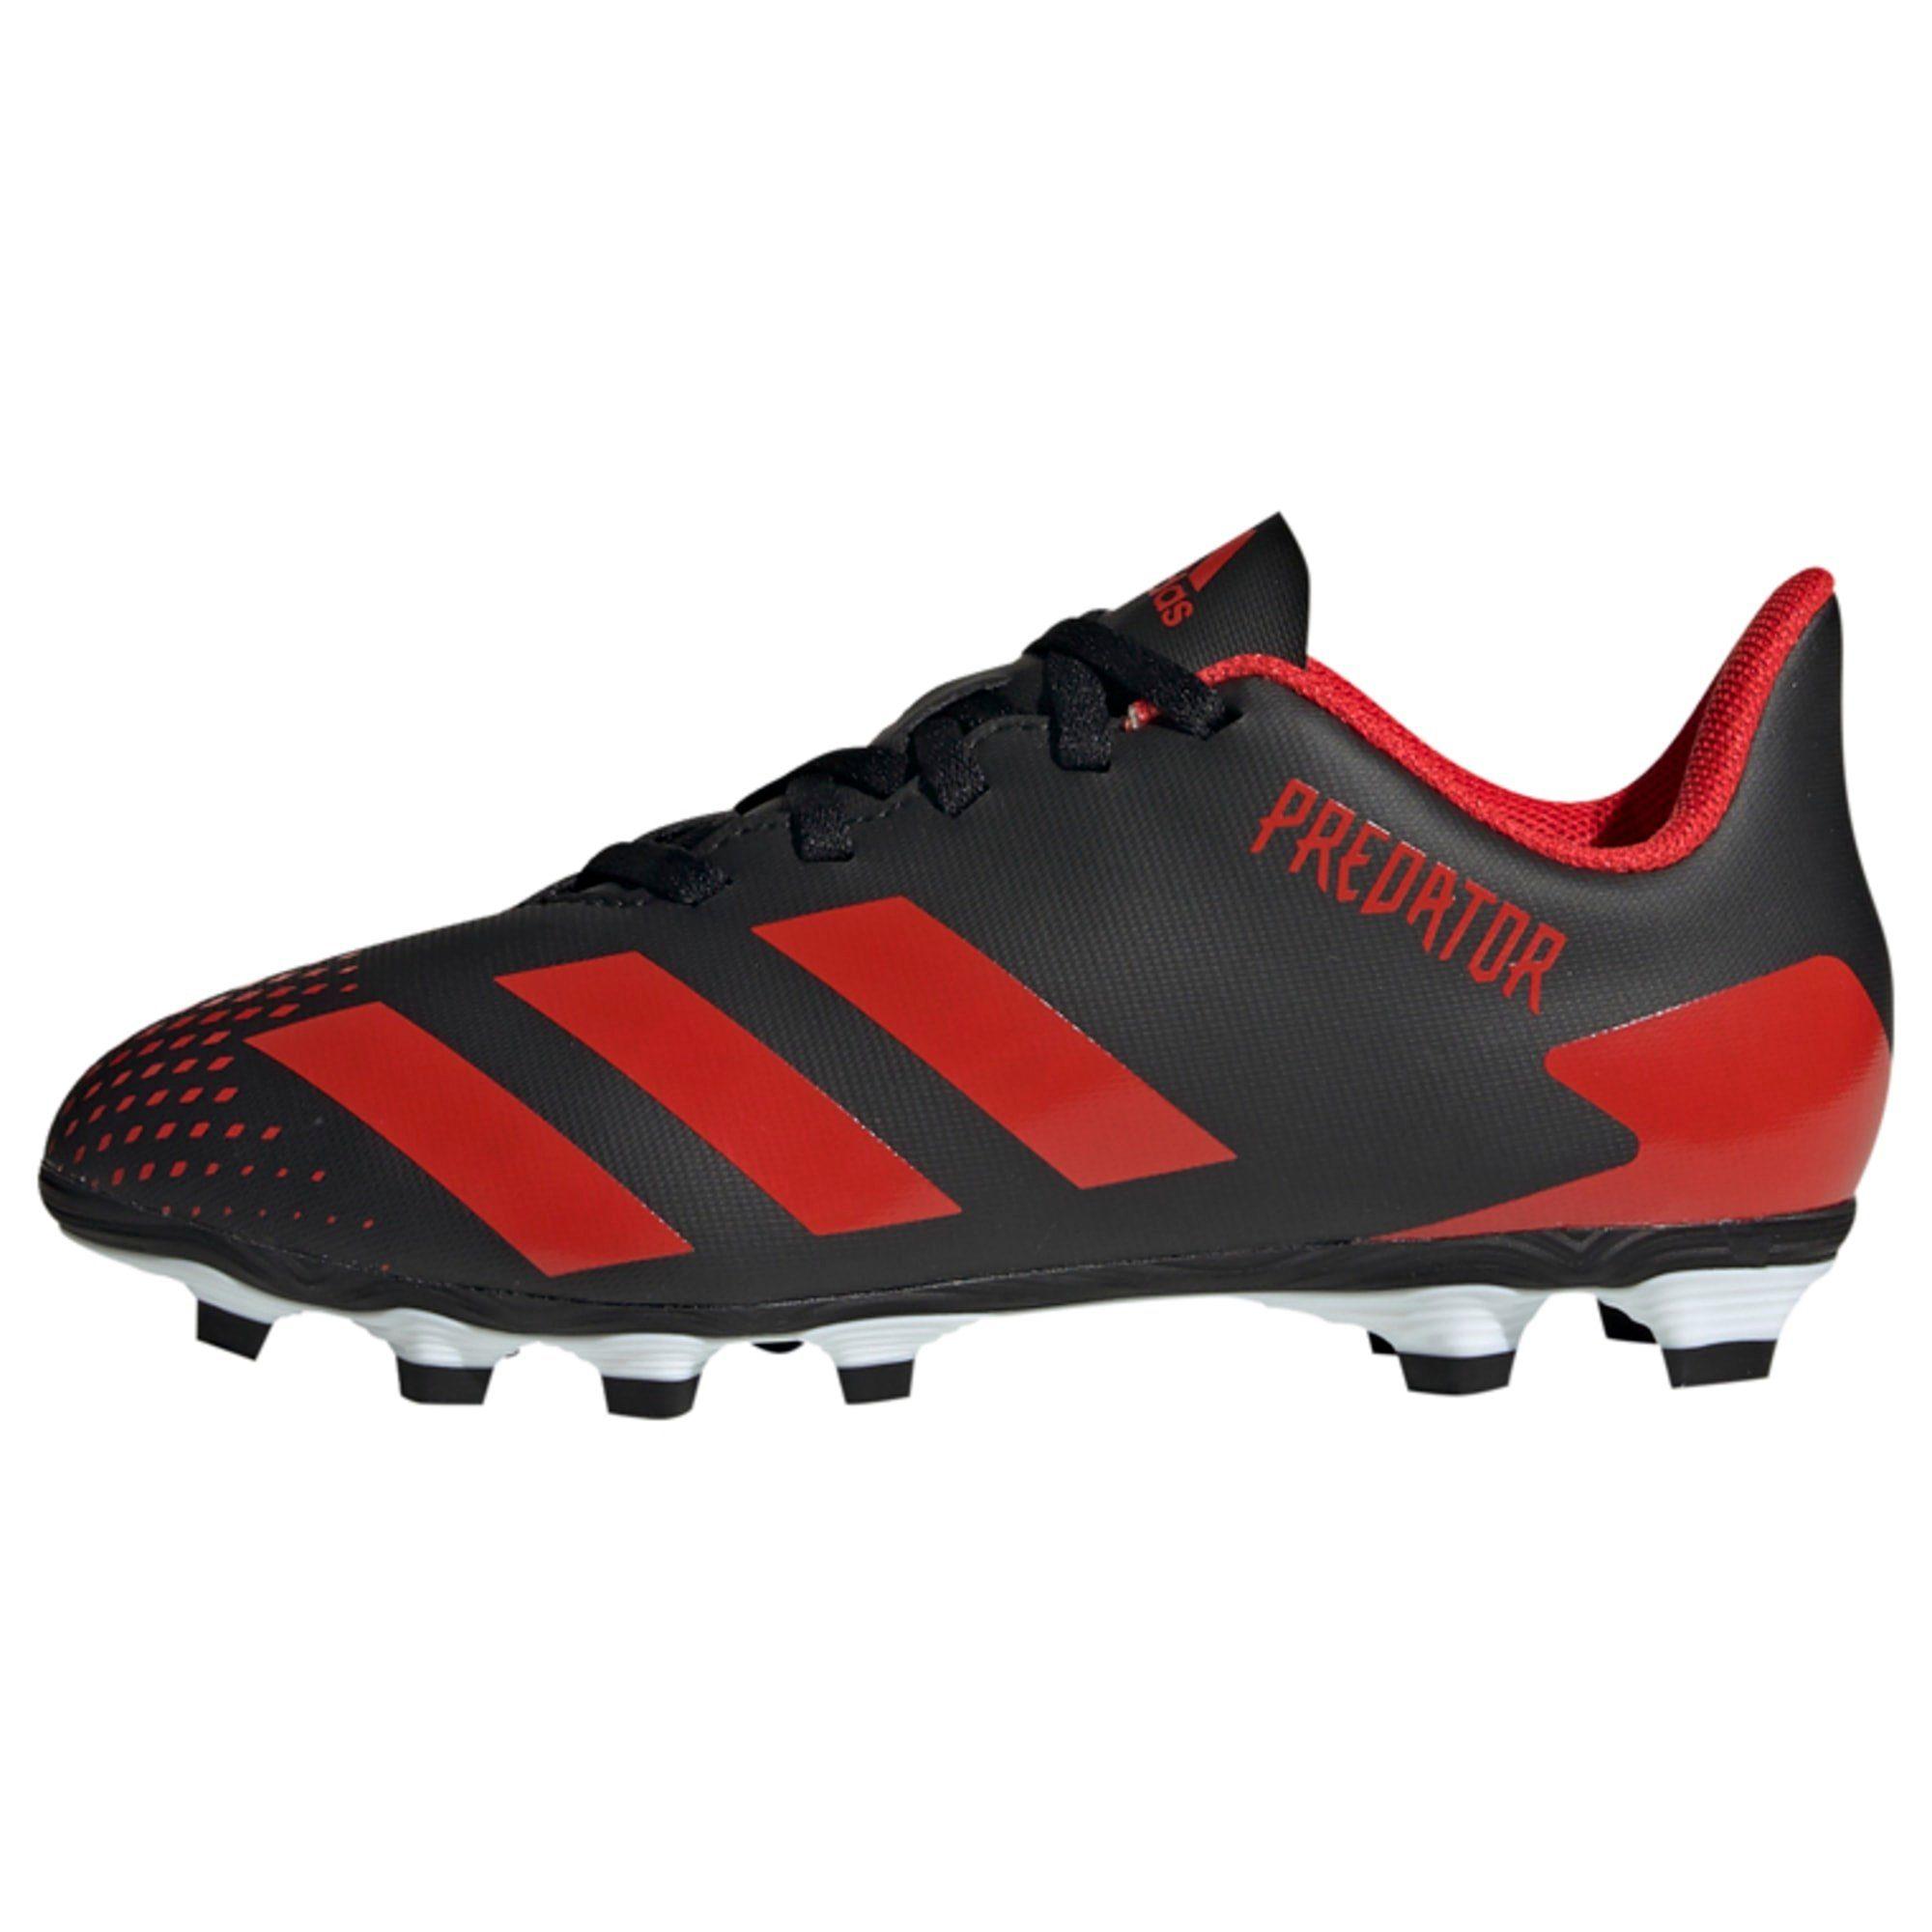 adidas Performance »Predator 20.4 FxG Fußballschuh« Fußballschuh Predator online kaufen | OTTO